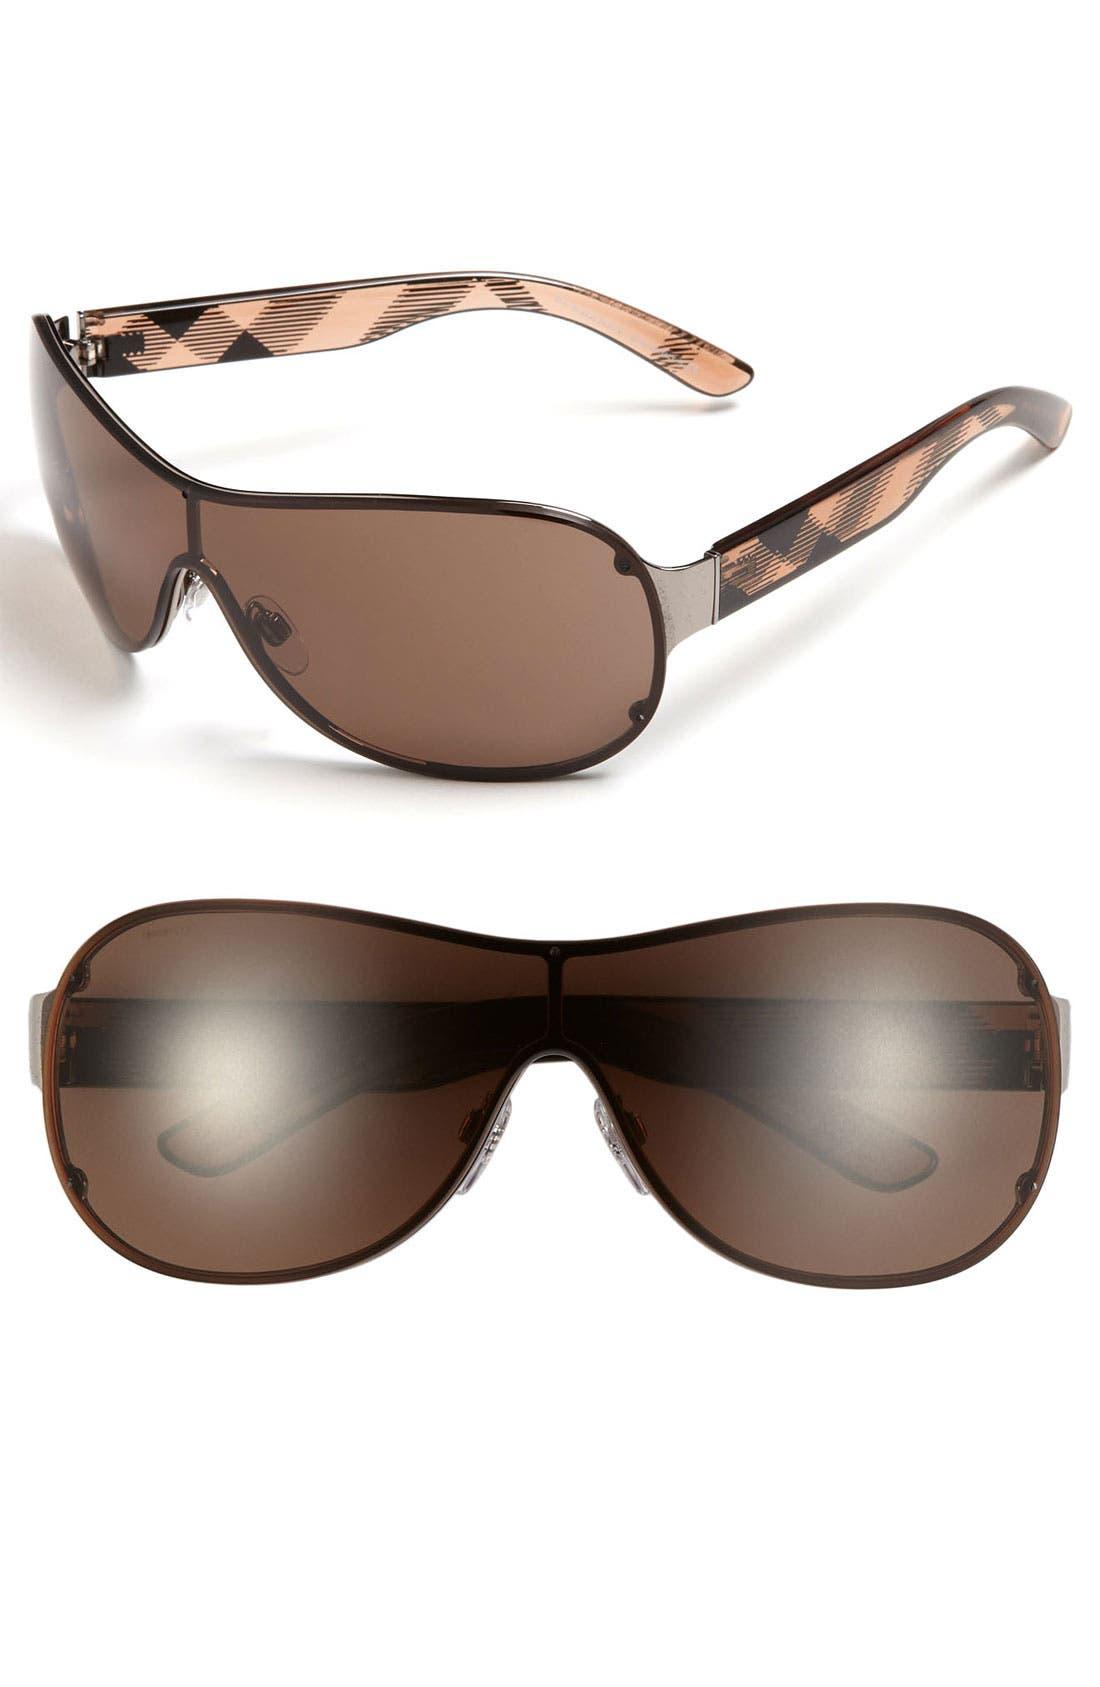 Main Image - Burberry 63mm Rimless Shield Sunglasses